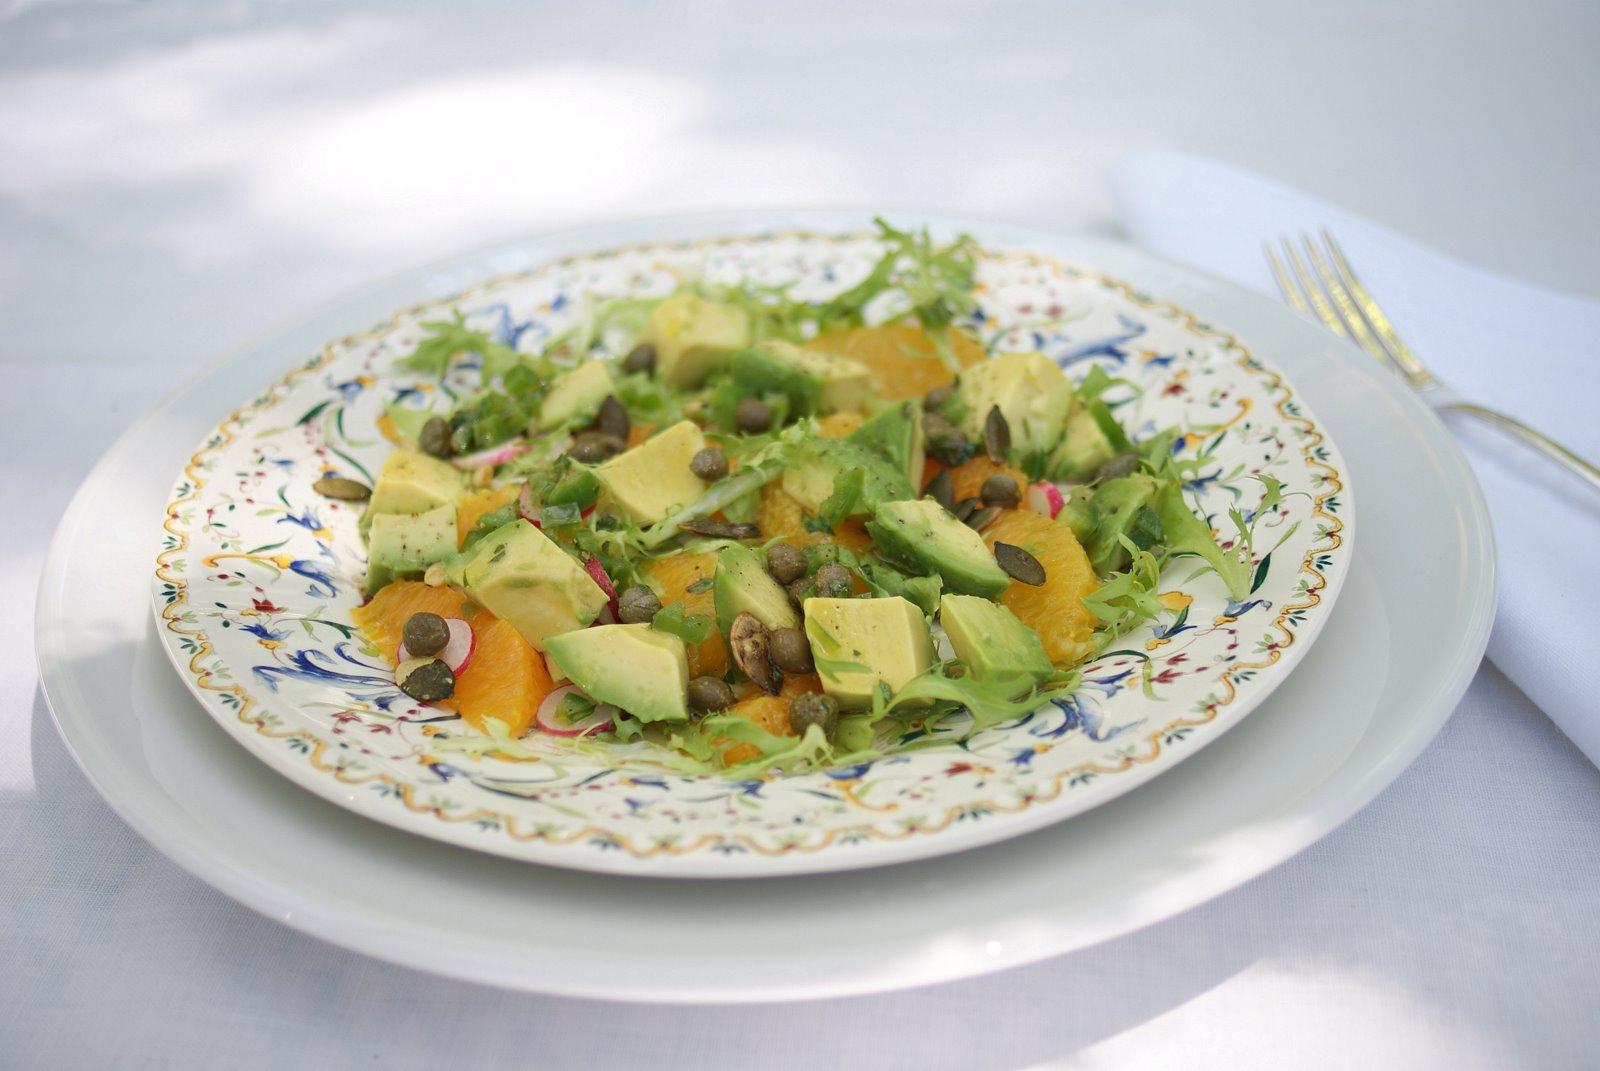 ... avocado salad avocado and radish sandwich avocado and orange salad